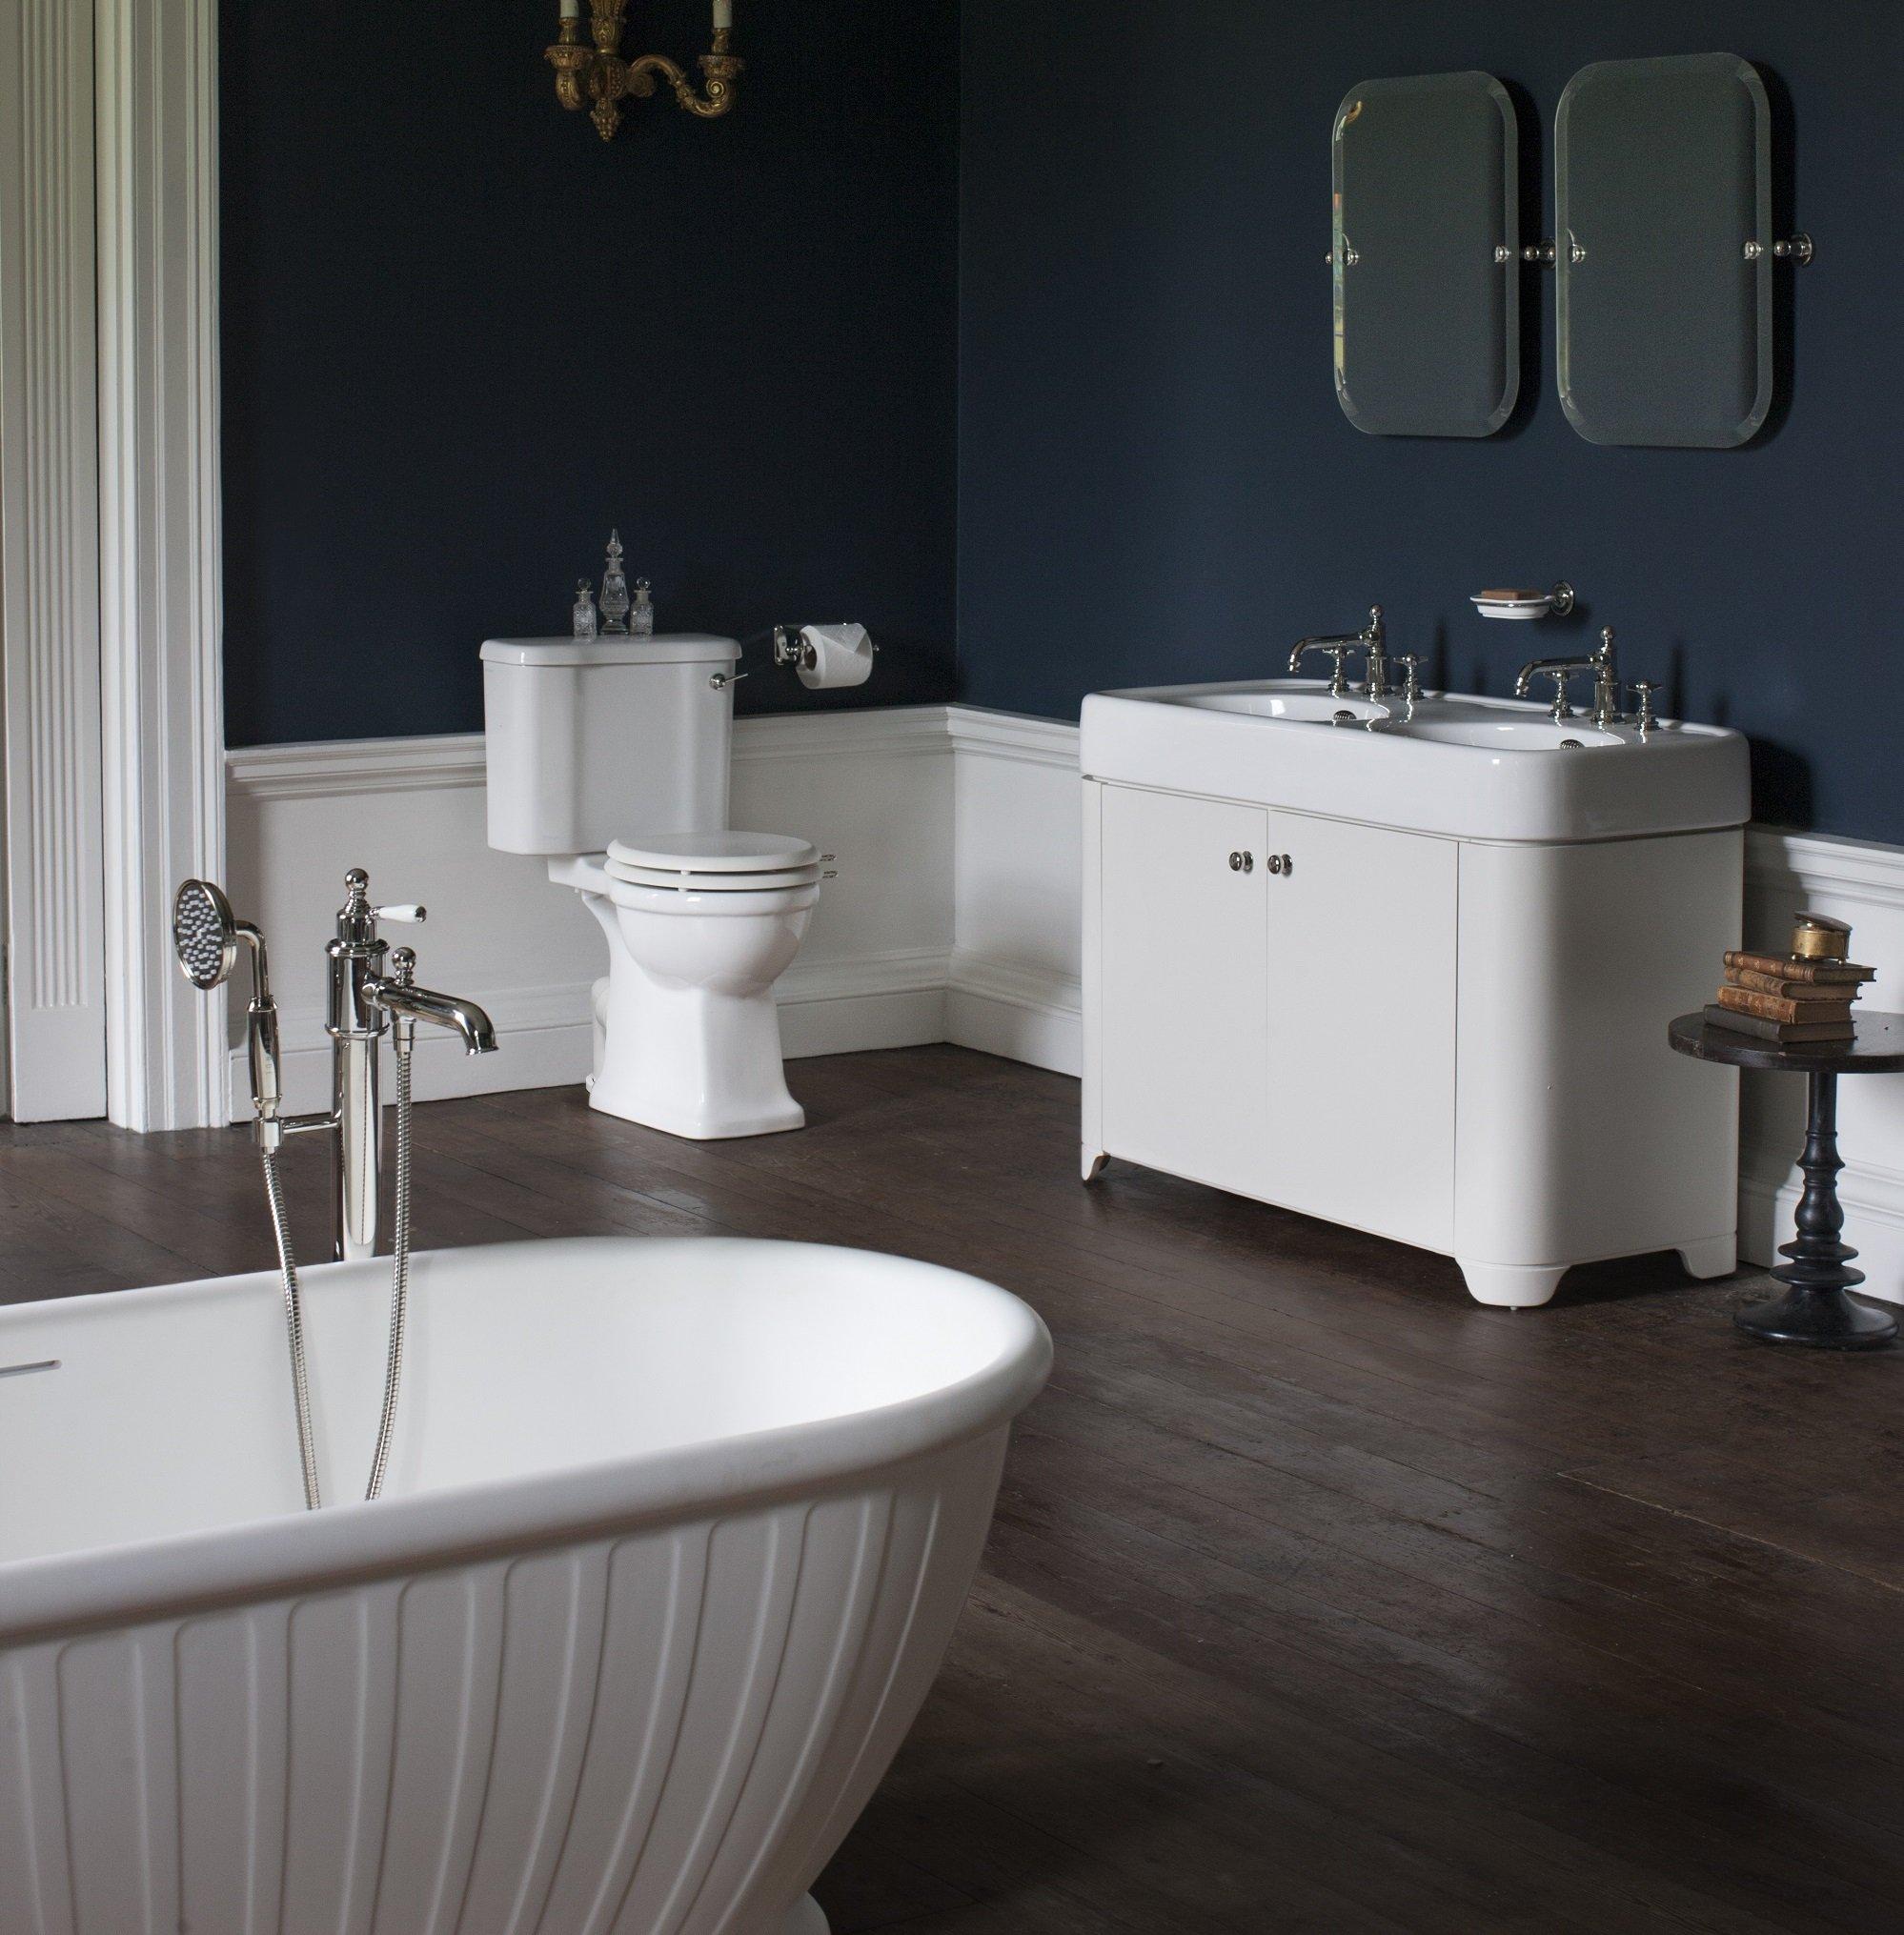 Quality kitchen, bathroom & bathroom services in Burgess Hill